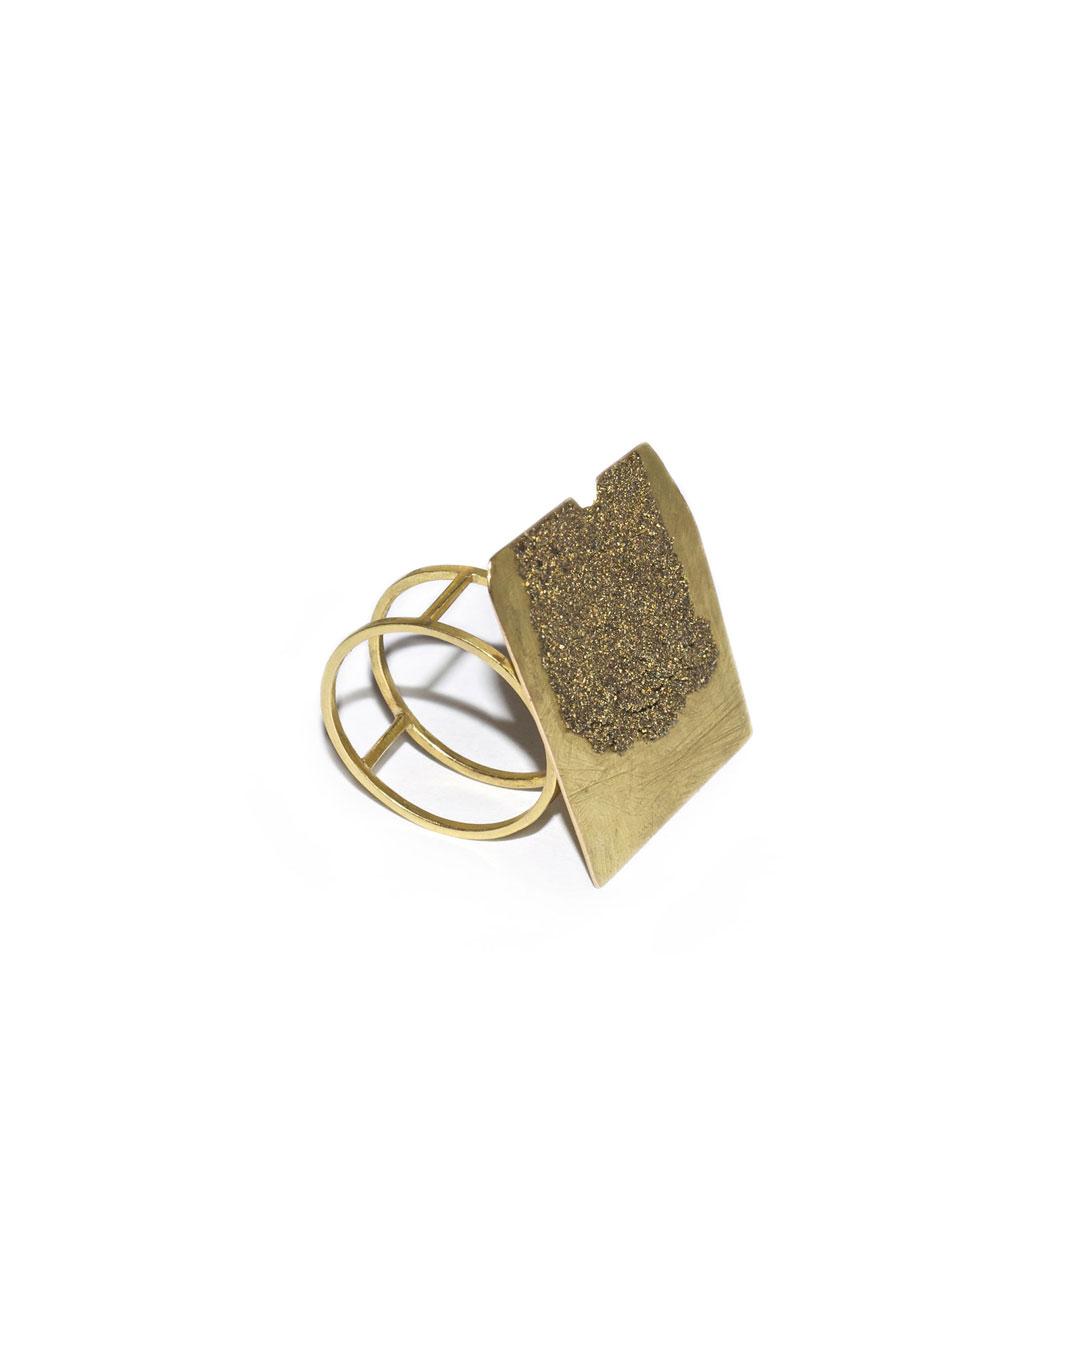 Stefano Marchetti, untitled, 2008, ring; gold, gold epoxy, 40 x 30 x 30 mm, €3000